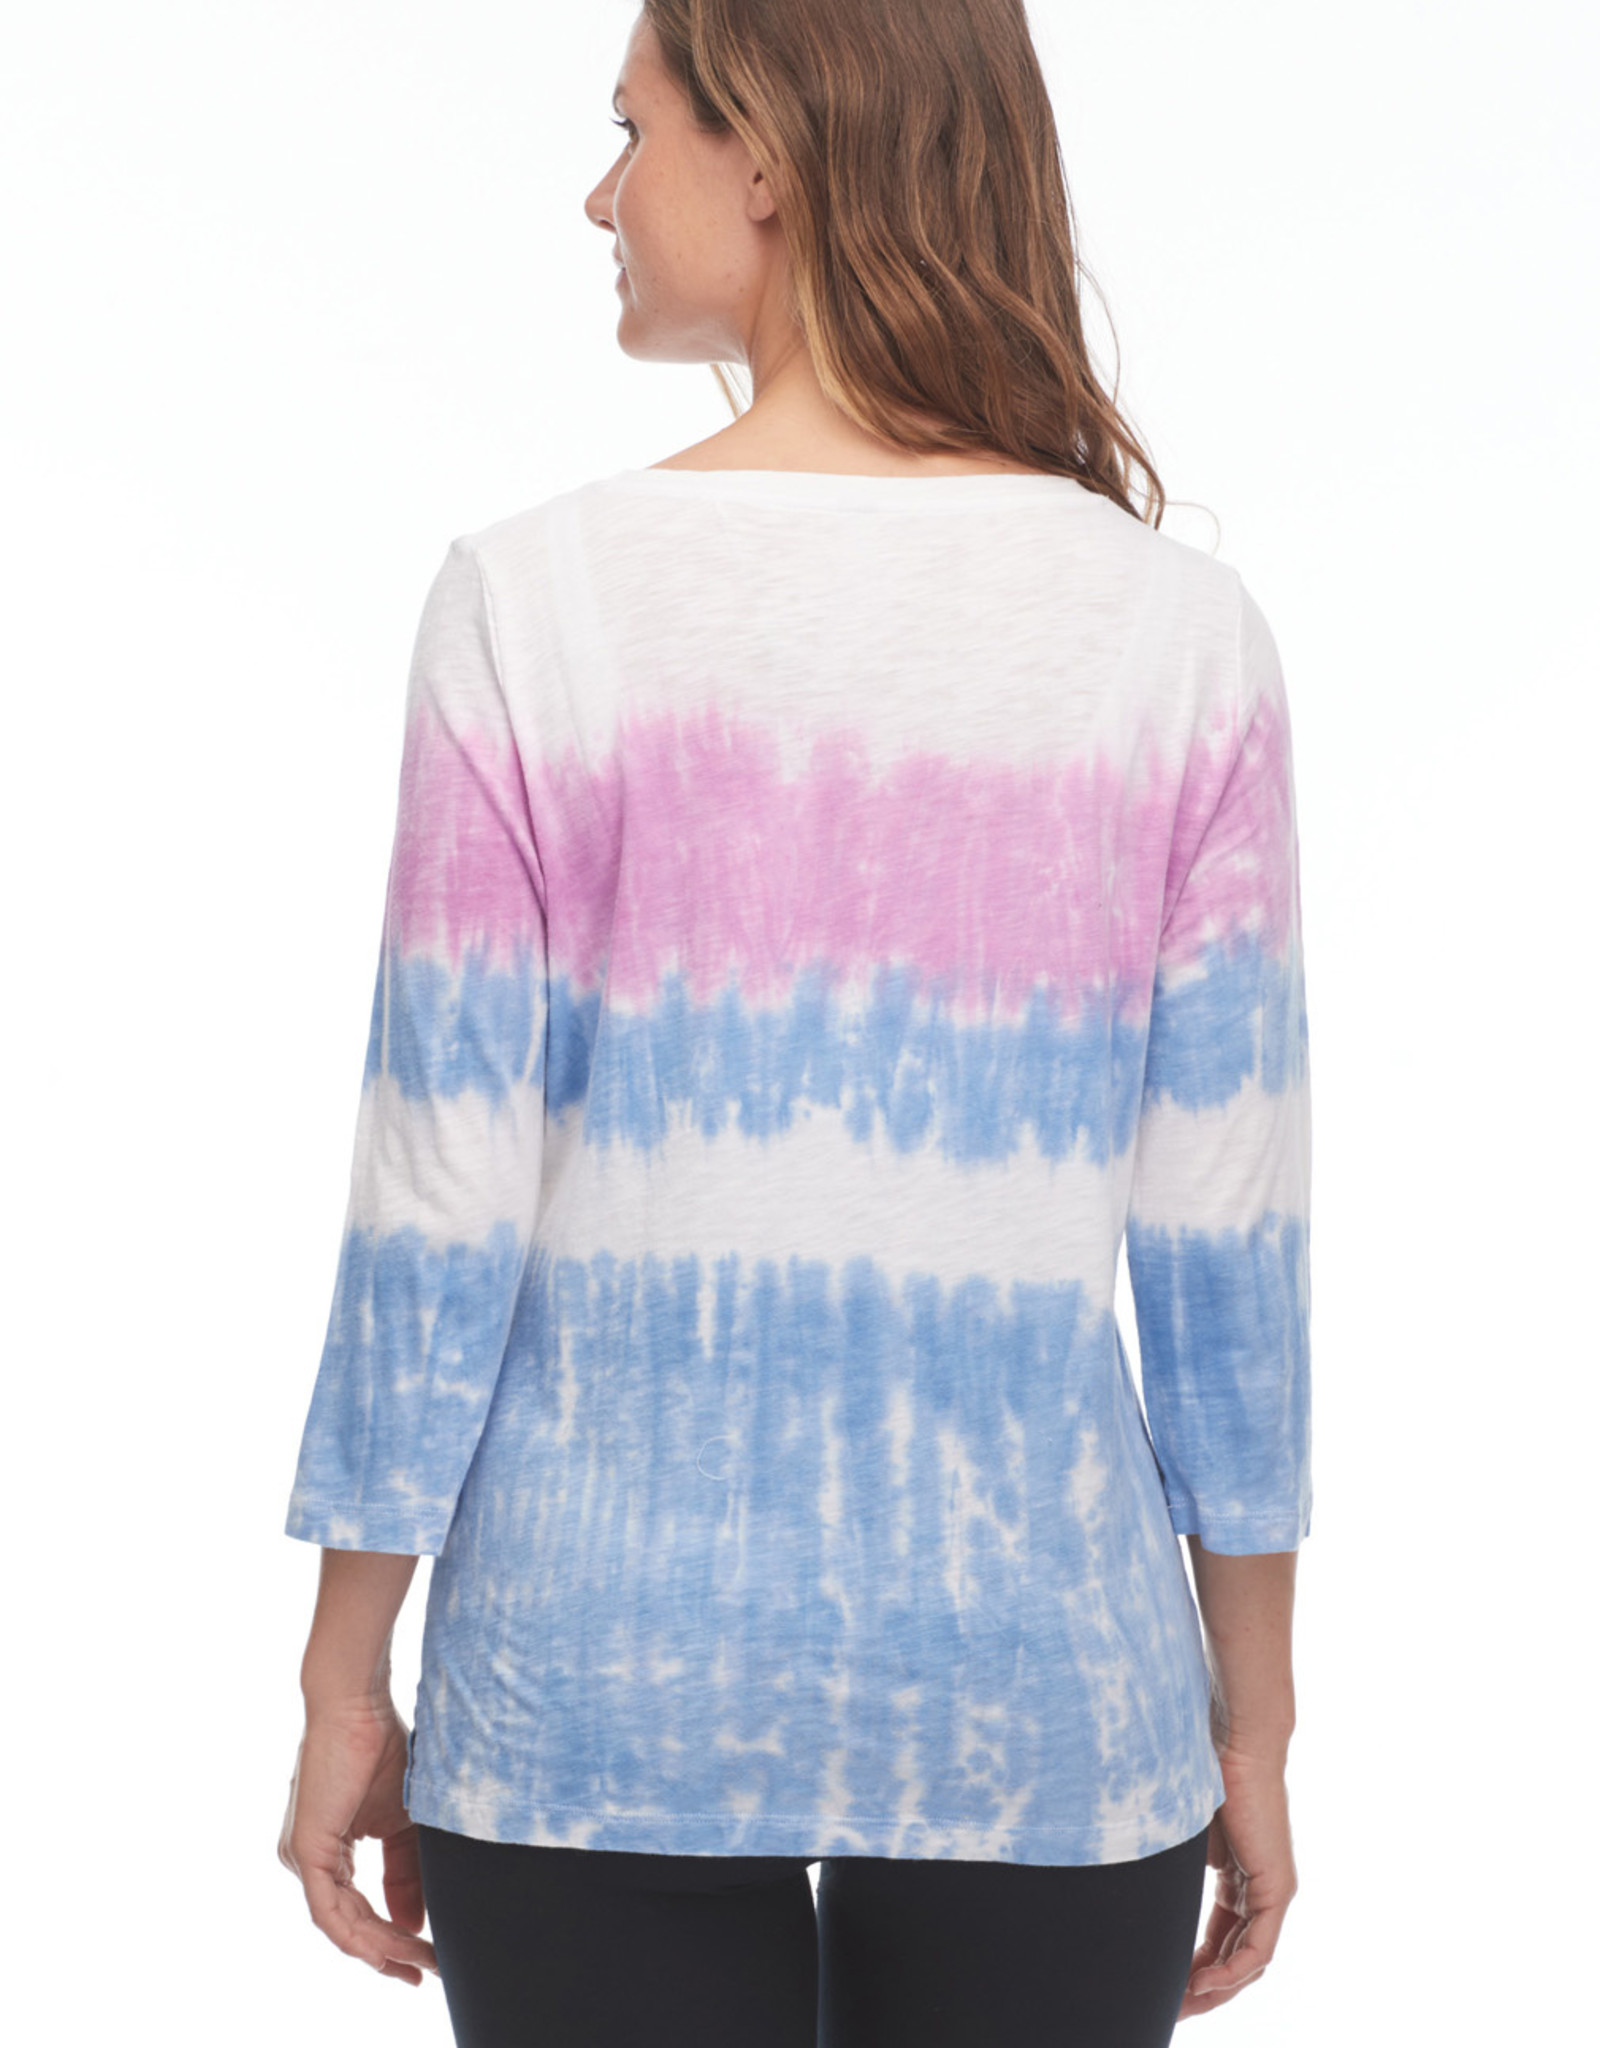 French Dressing Jeans FDJ 1302476 Tie Dye Scoop Neck Top